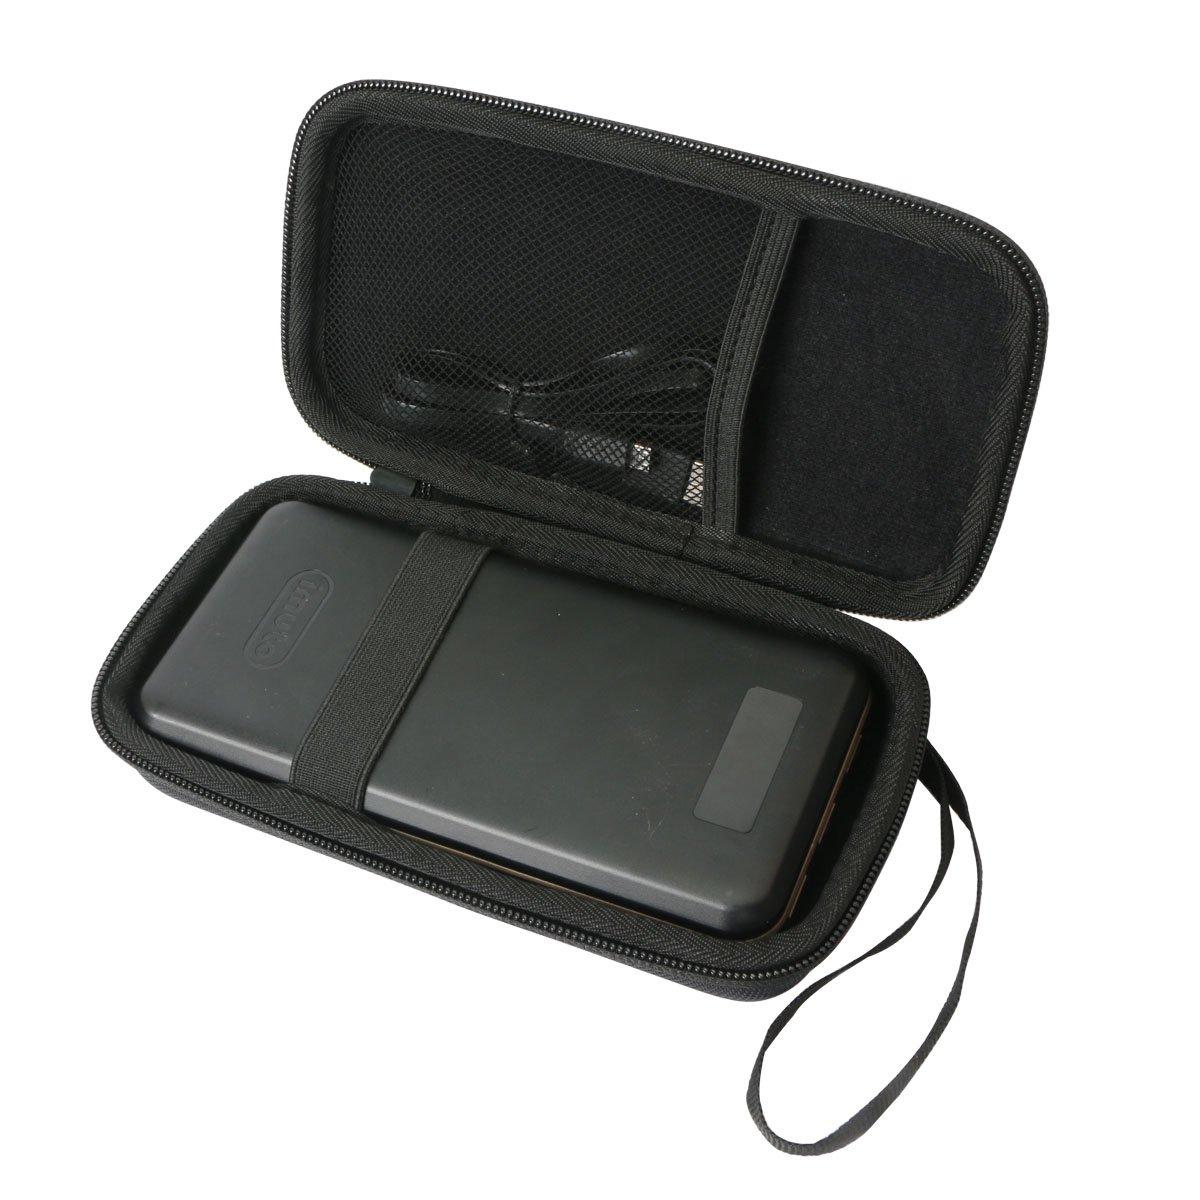 Khanka Hard Case for iMuto 30000mAh Portable Charger X6, 3-Port USB Output Power Bank External Battery